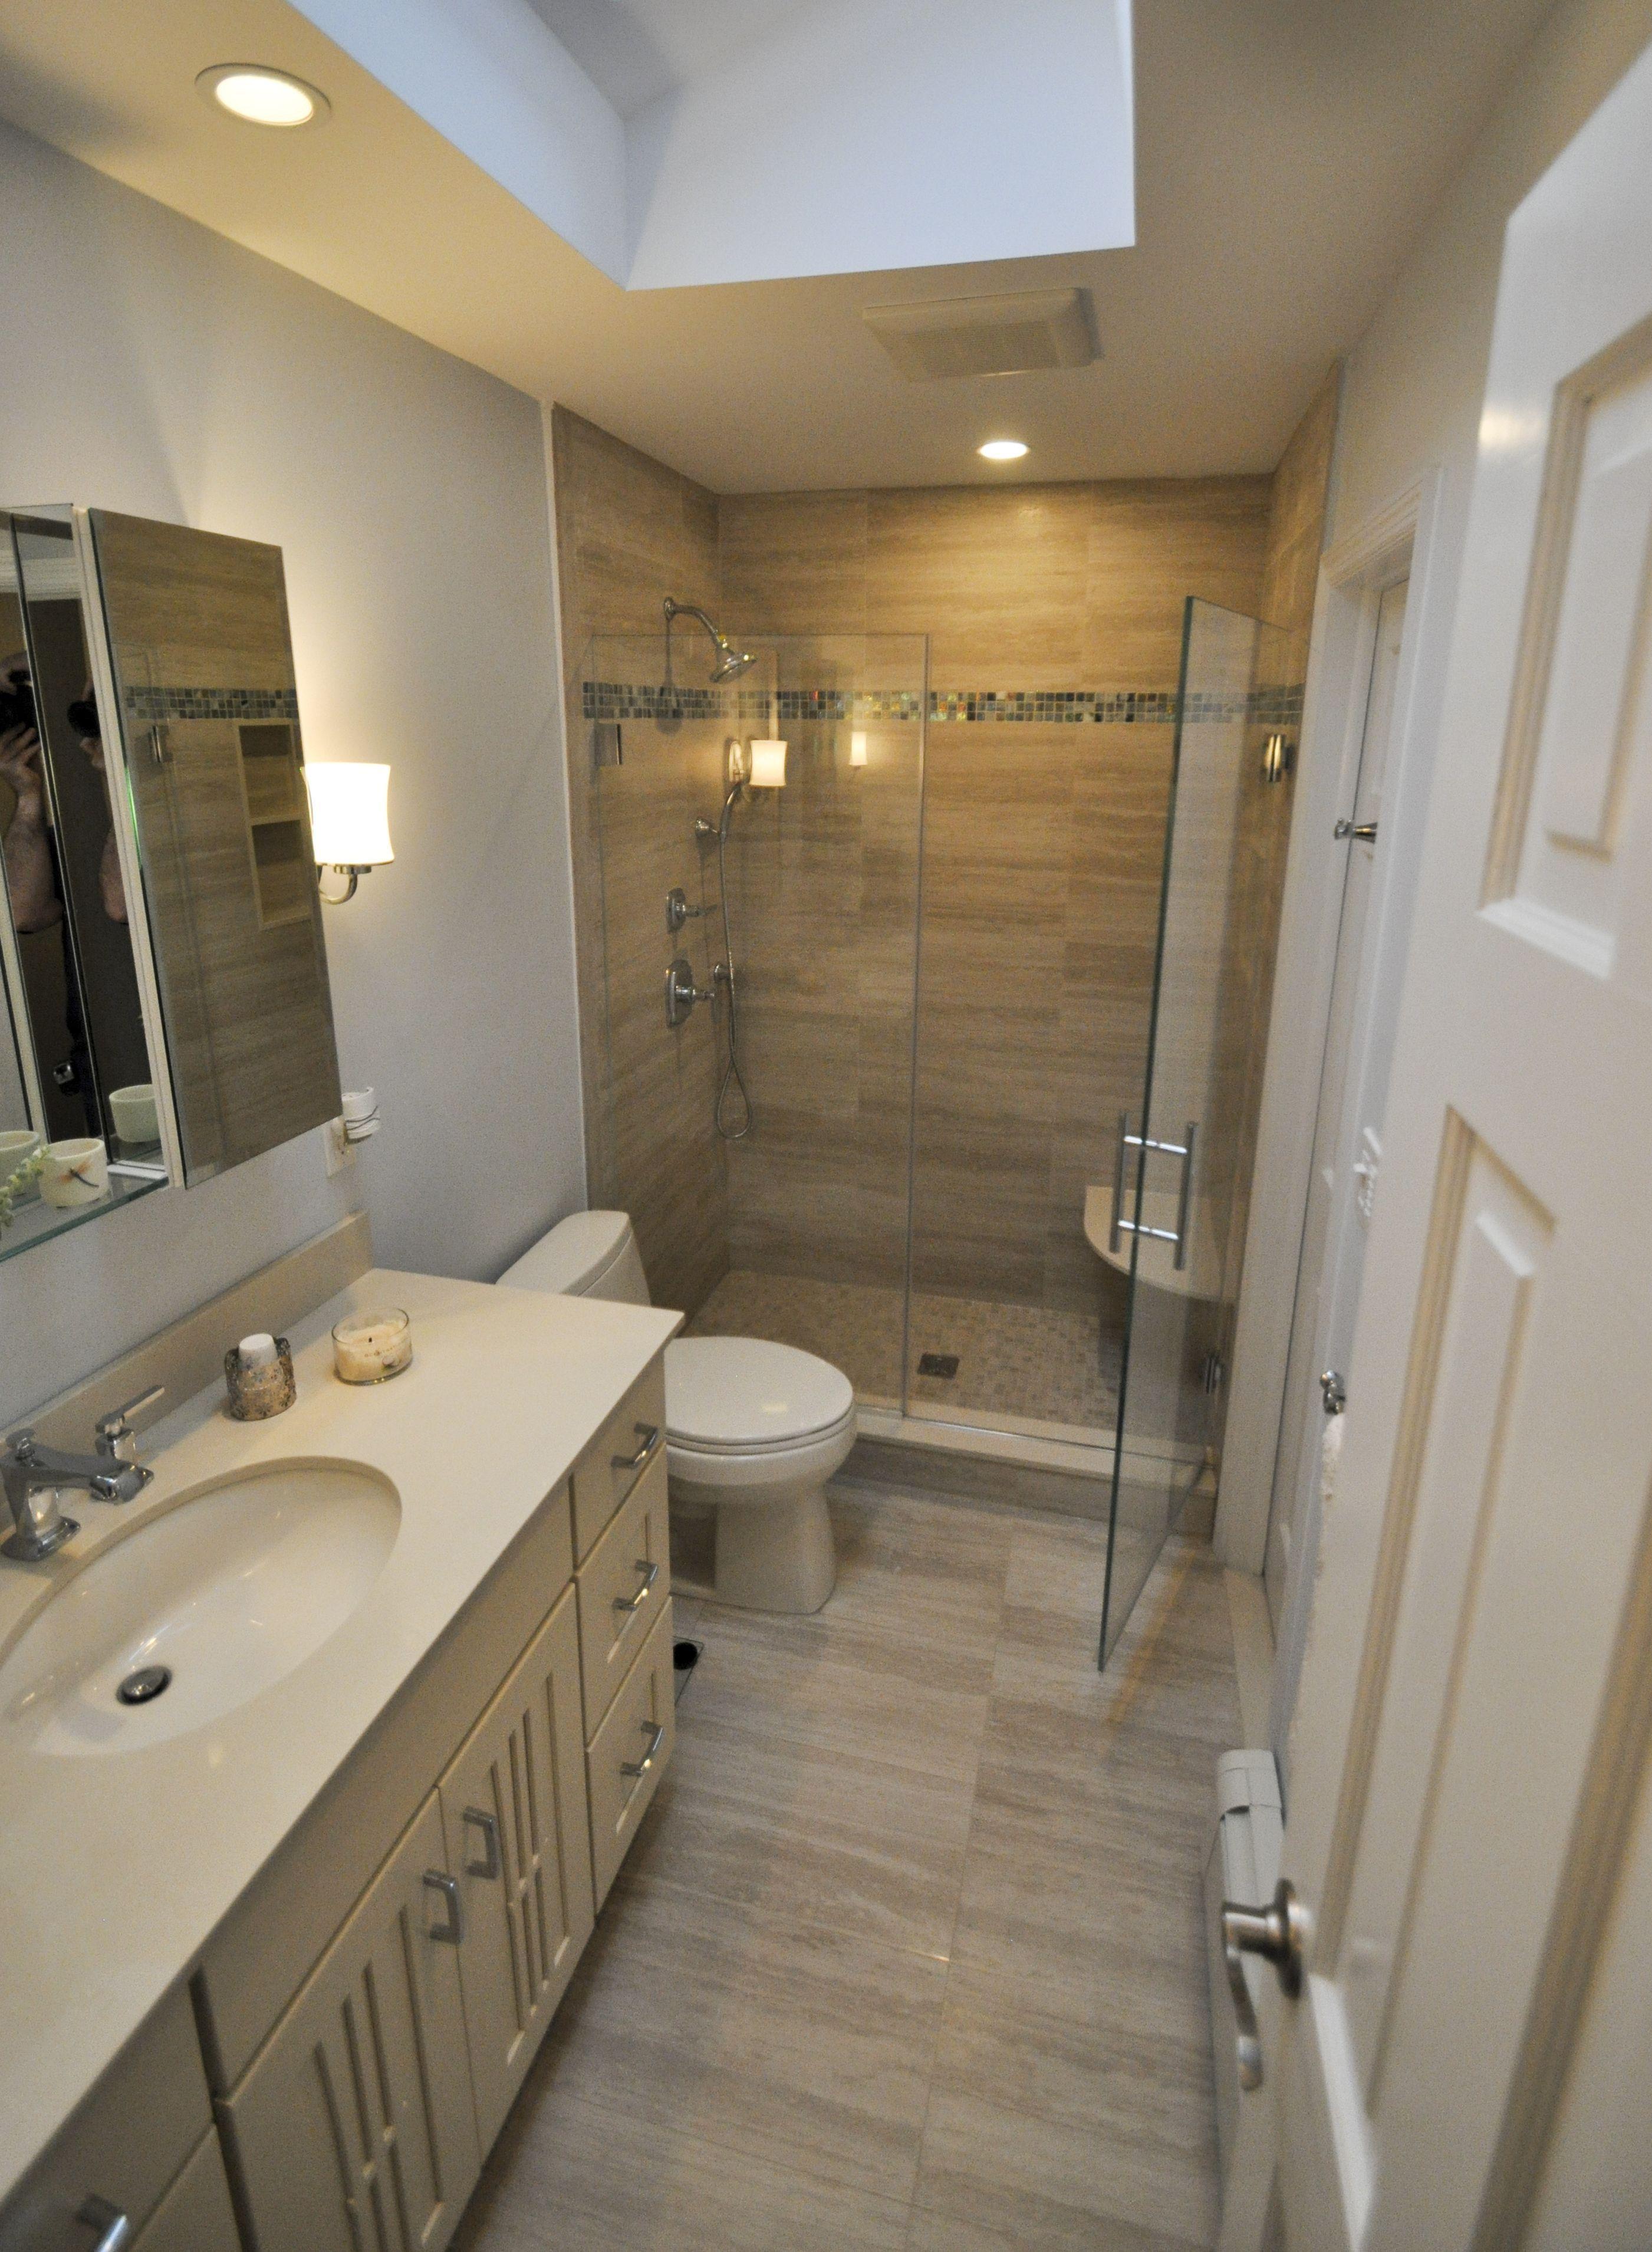 Basement Bathroom Ideas Small Bathroom Layout Bathroom Layout Bathrooms Remodel